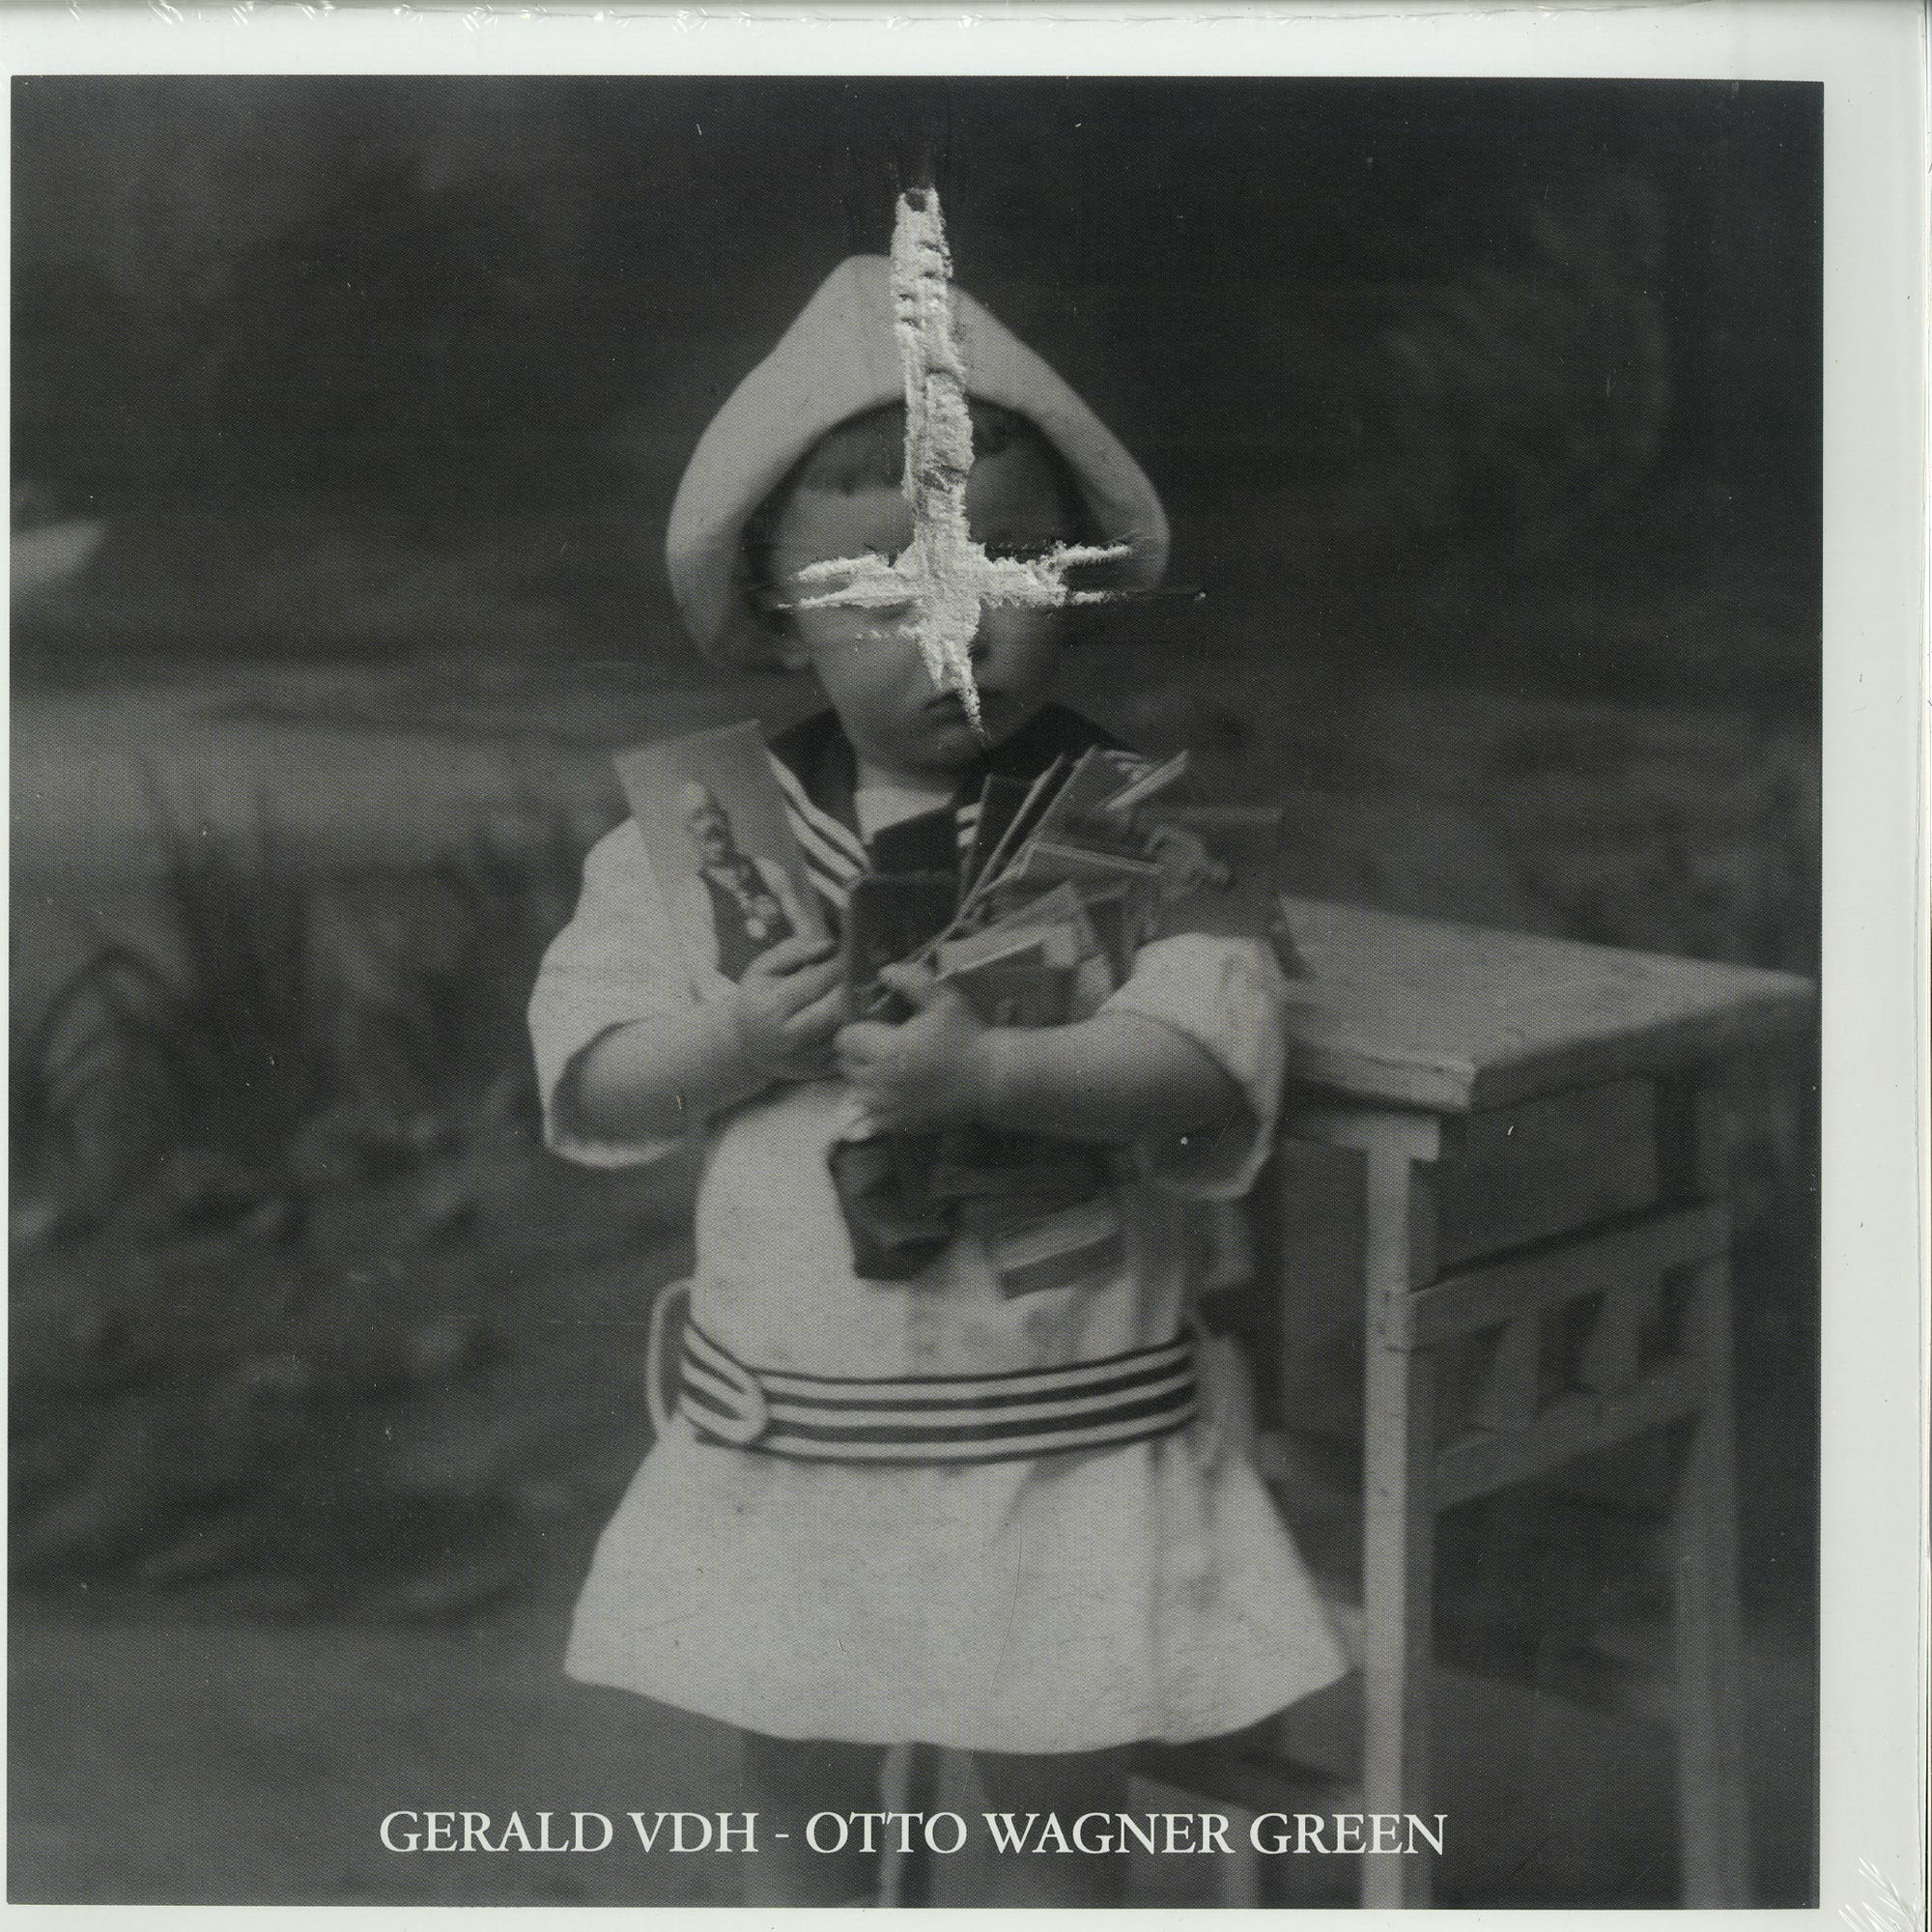 Gerald VDH - OTTO WAGNER GREEN